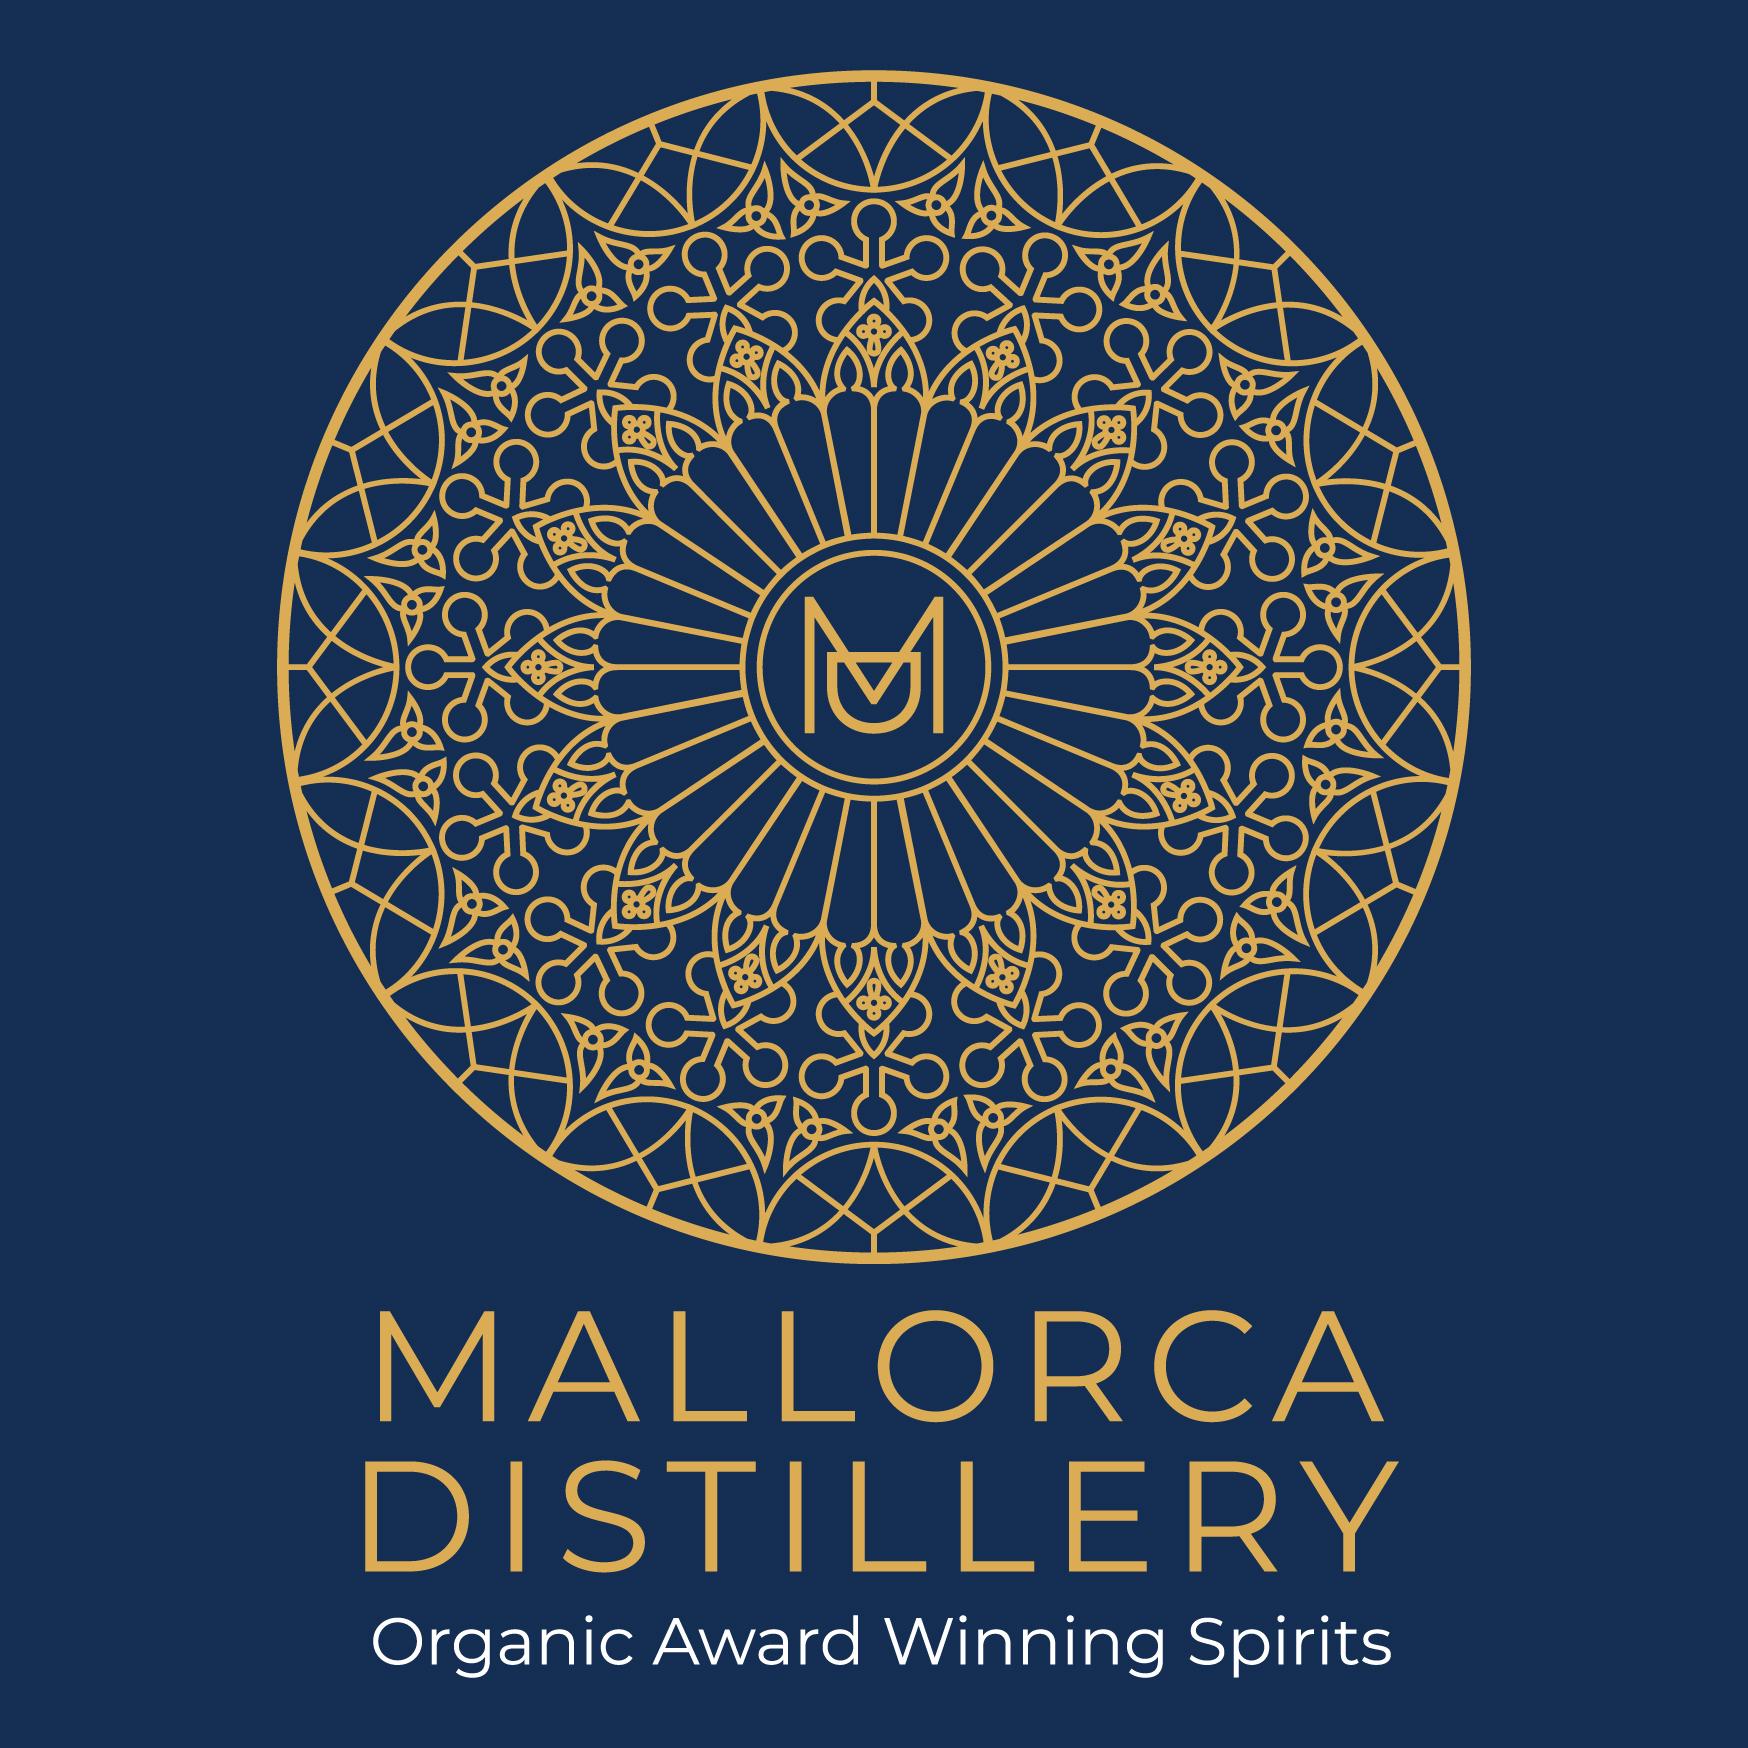 https://www.mncjobs.co.uk/company/mallorca-distillery-sl